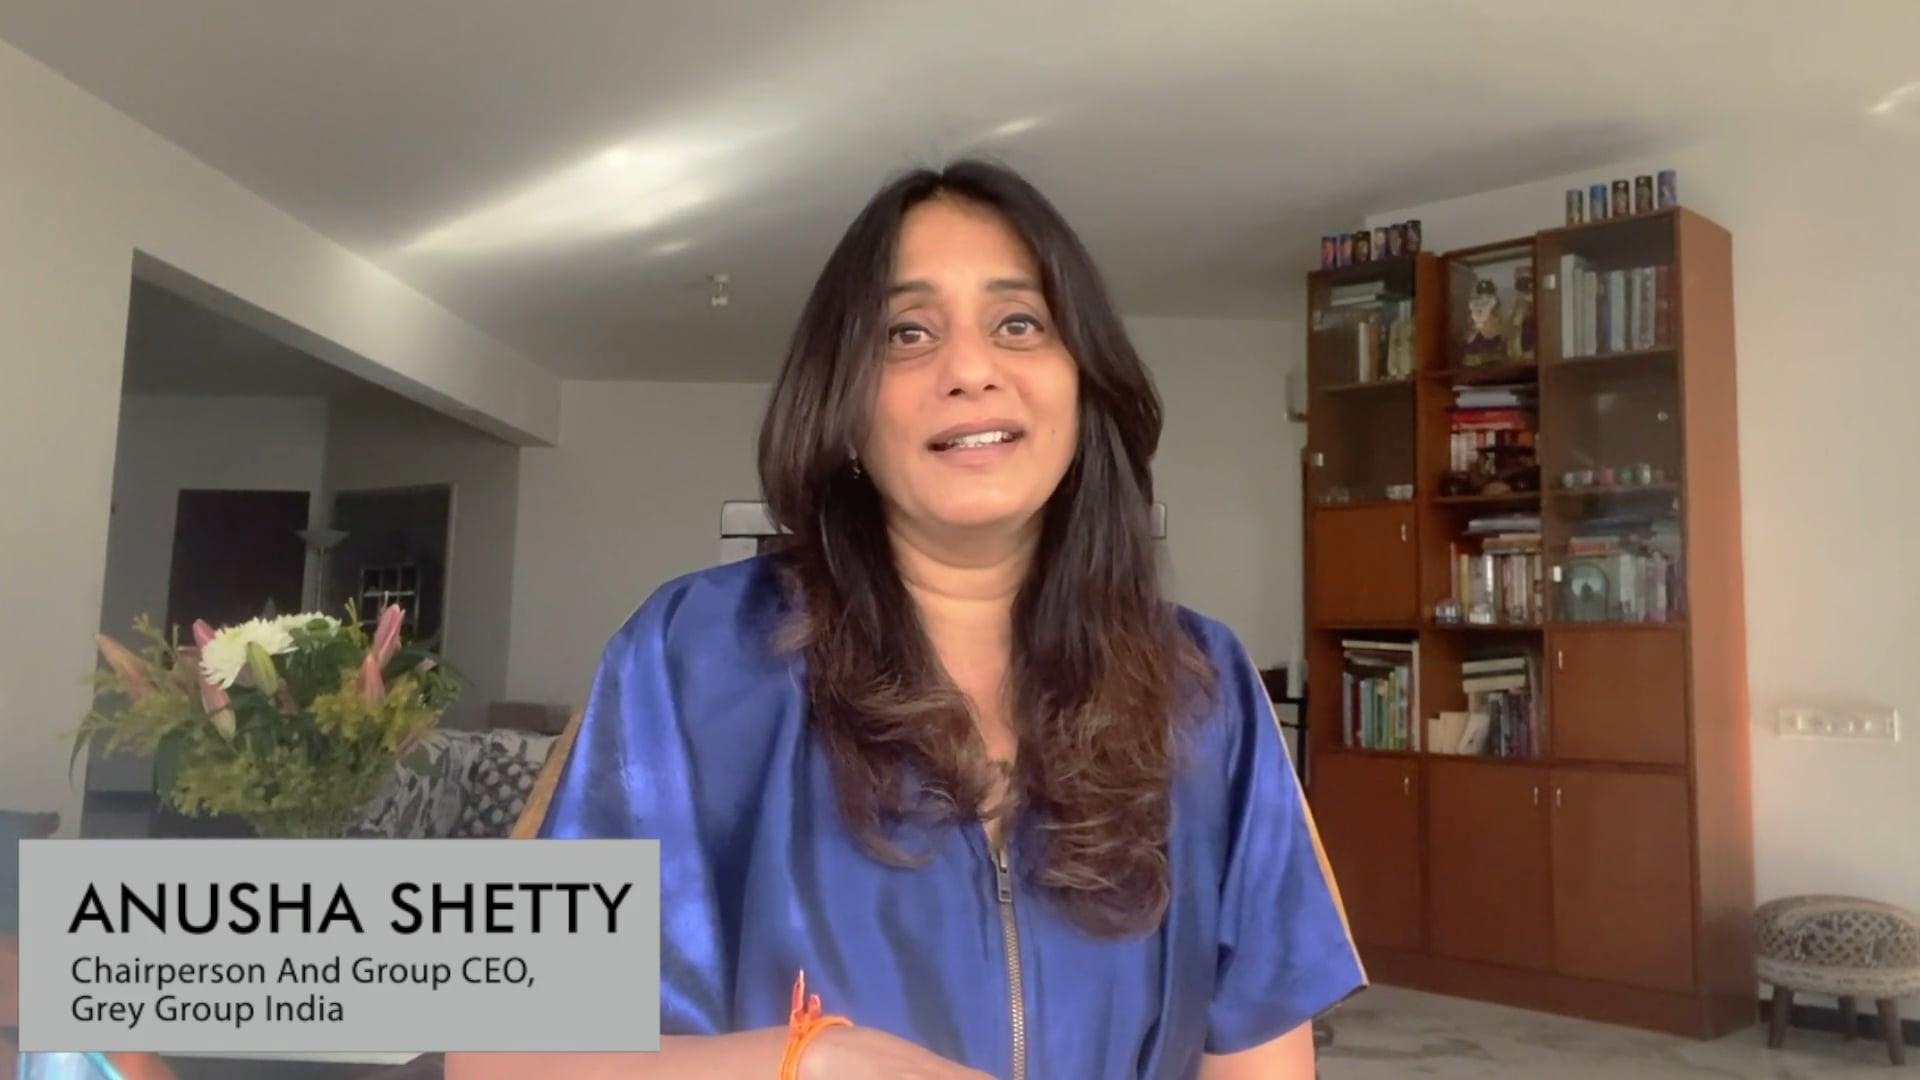 Anusha Shetty on 'The Right Choice' book